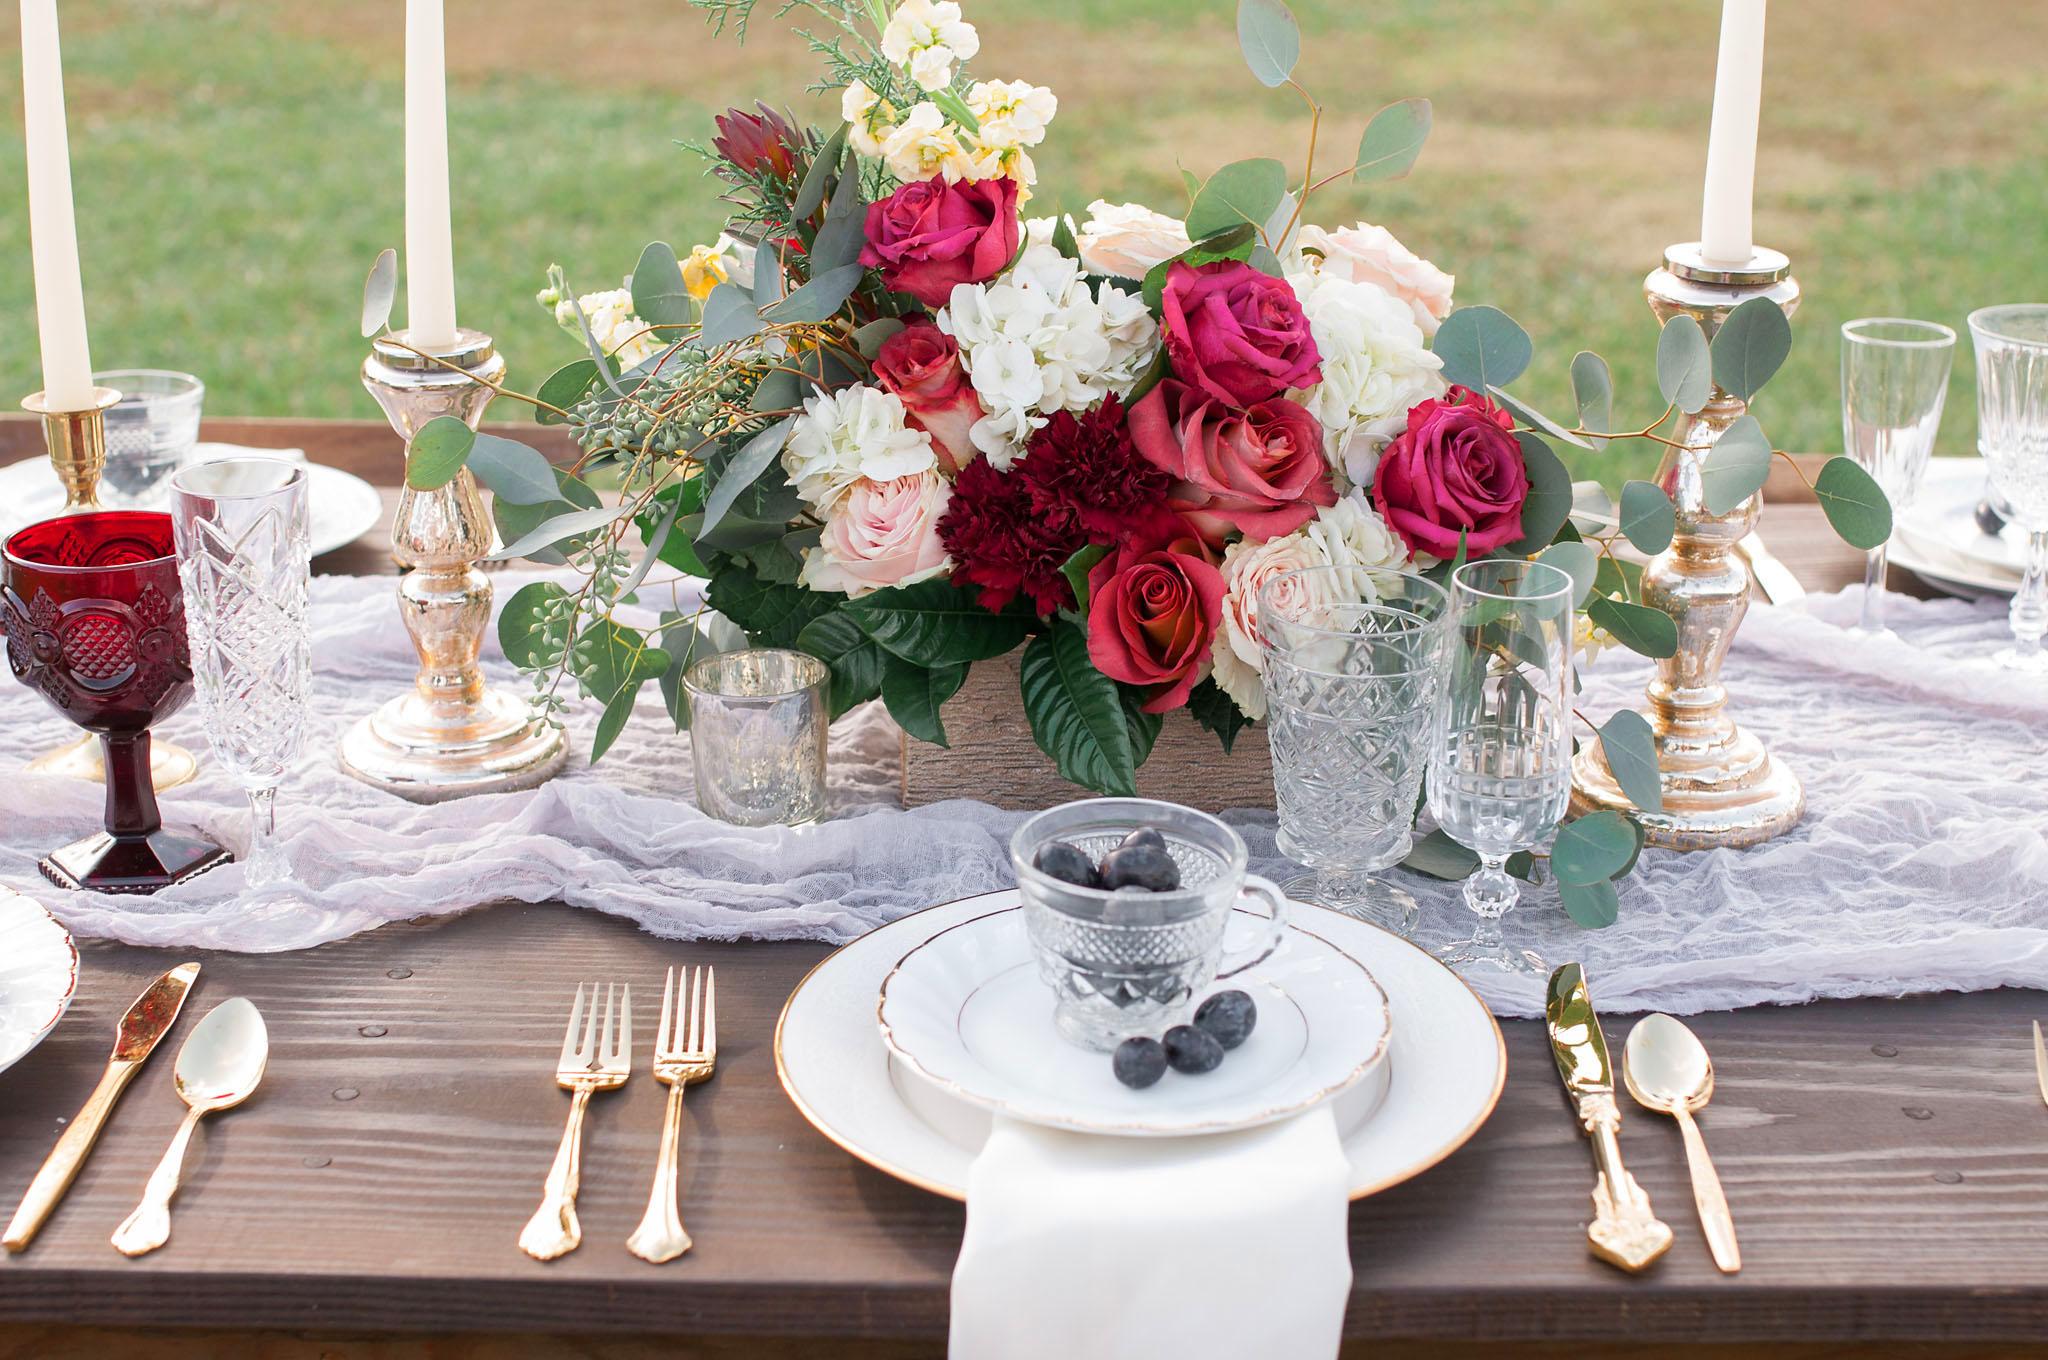 Orlando Tampa Lakeland Wedding Planner and Designer